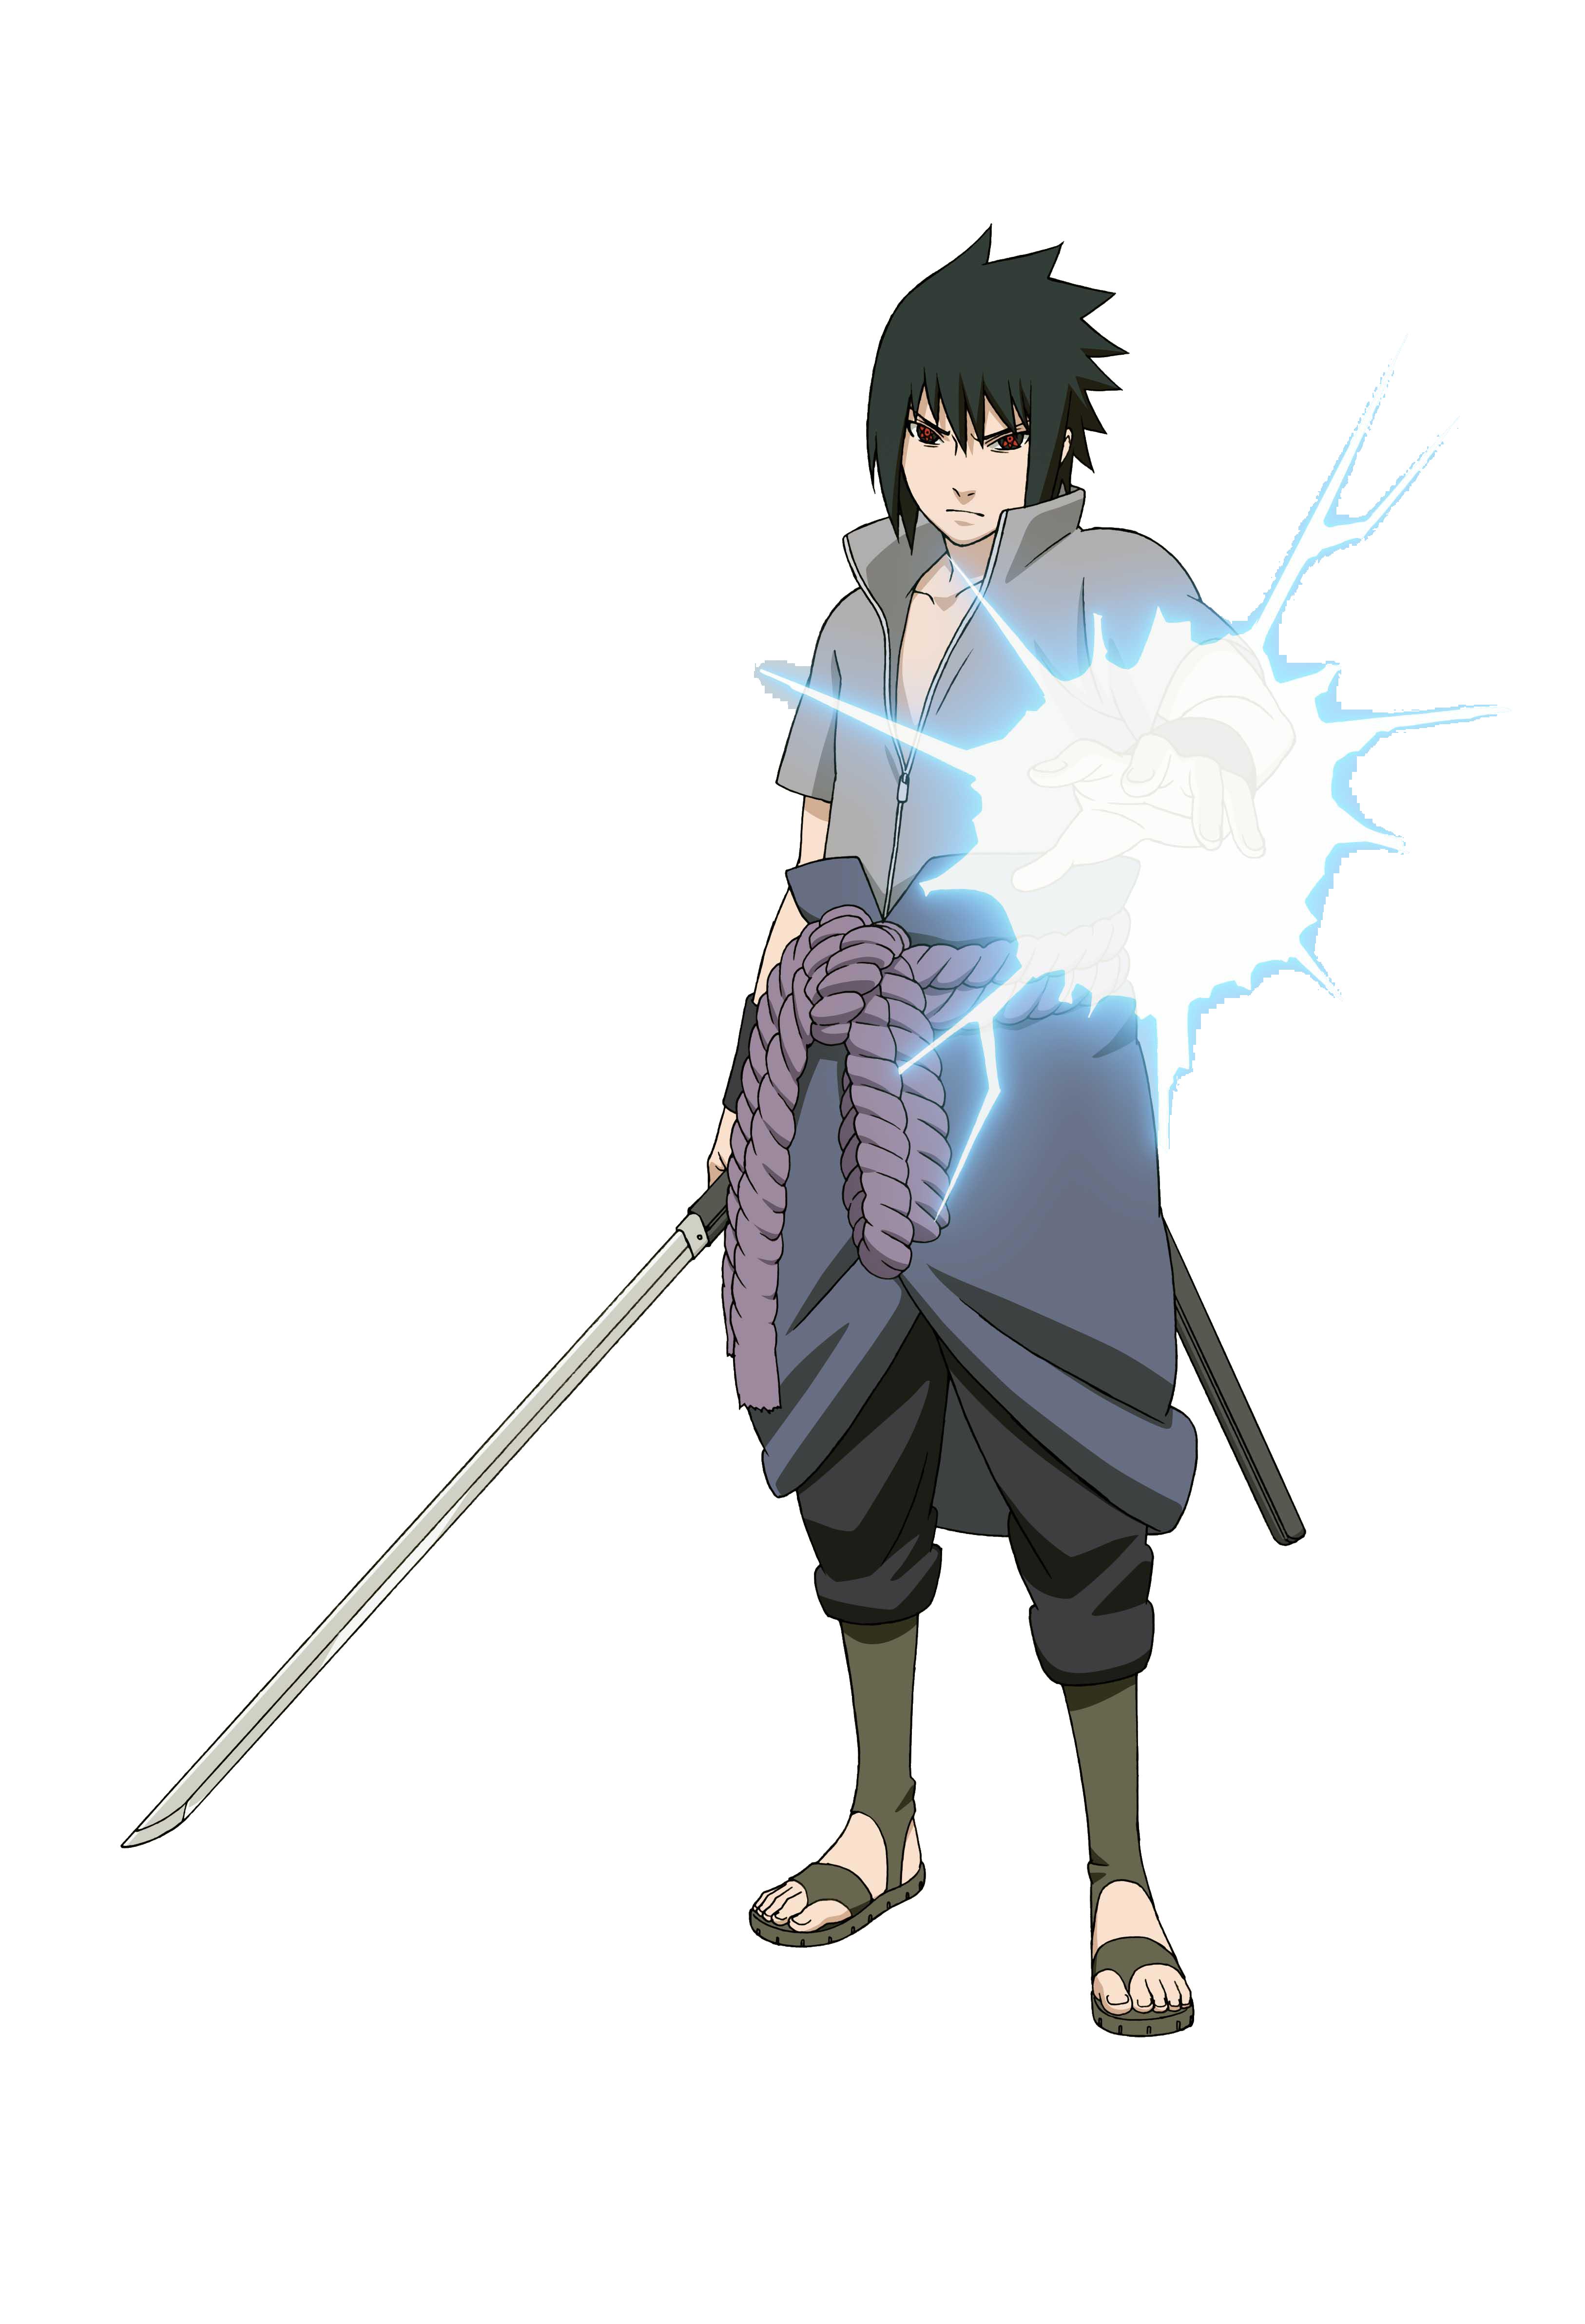 Best Sasuke Outfit? - Black Sasuke